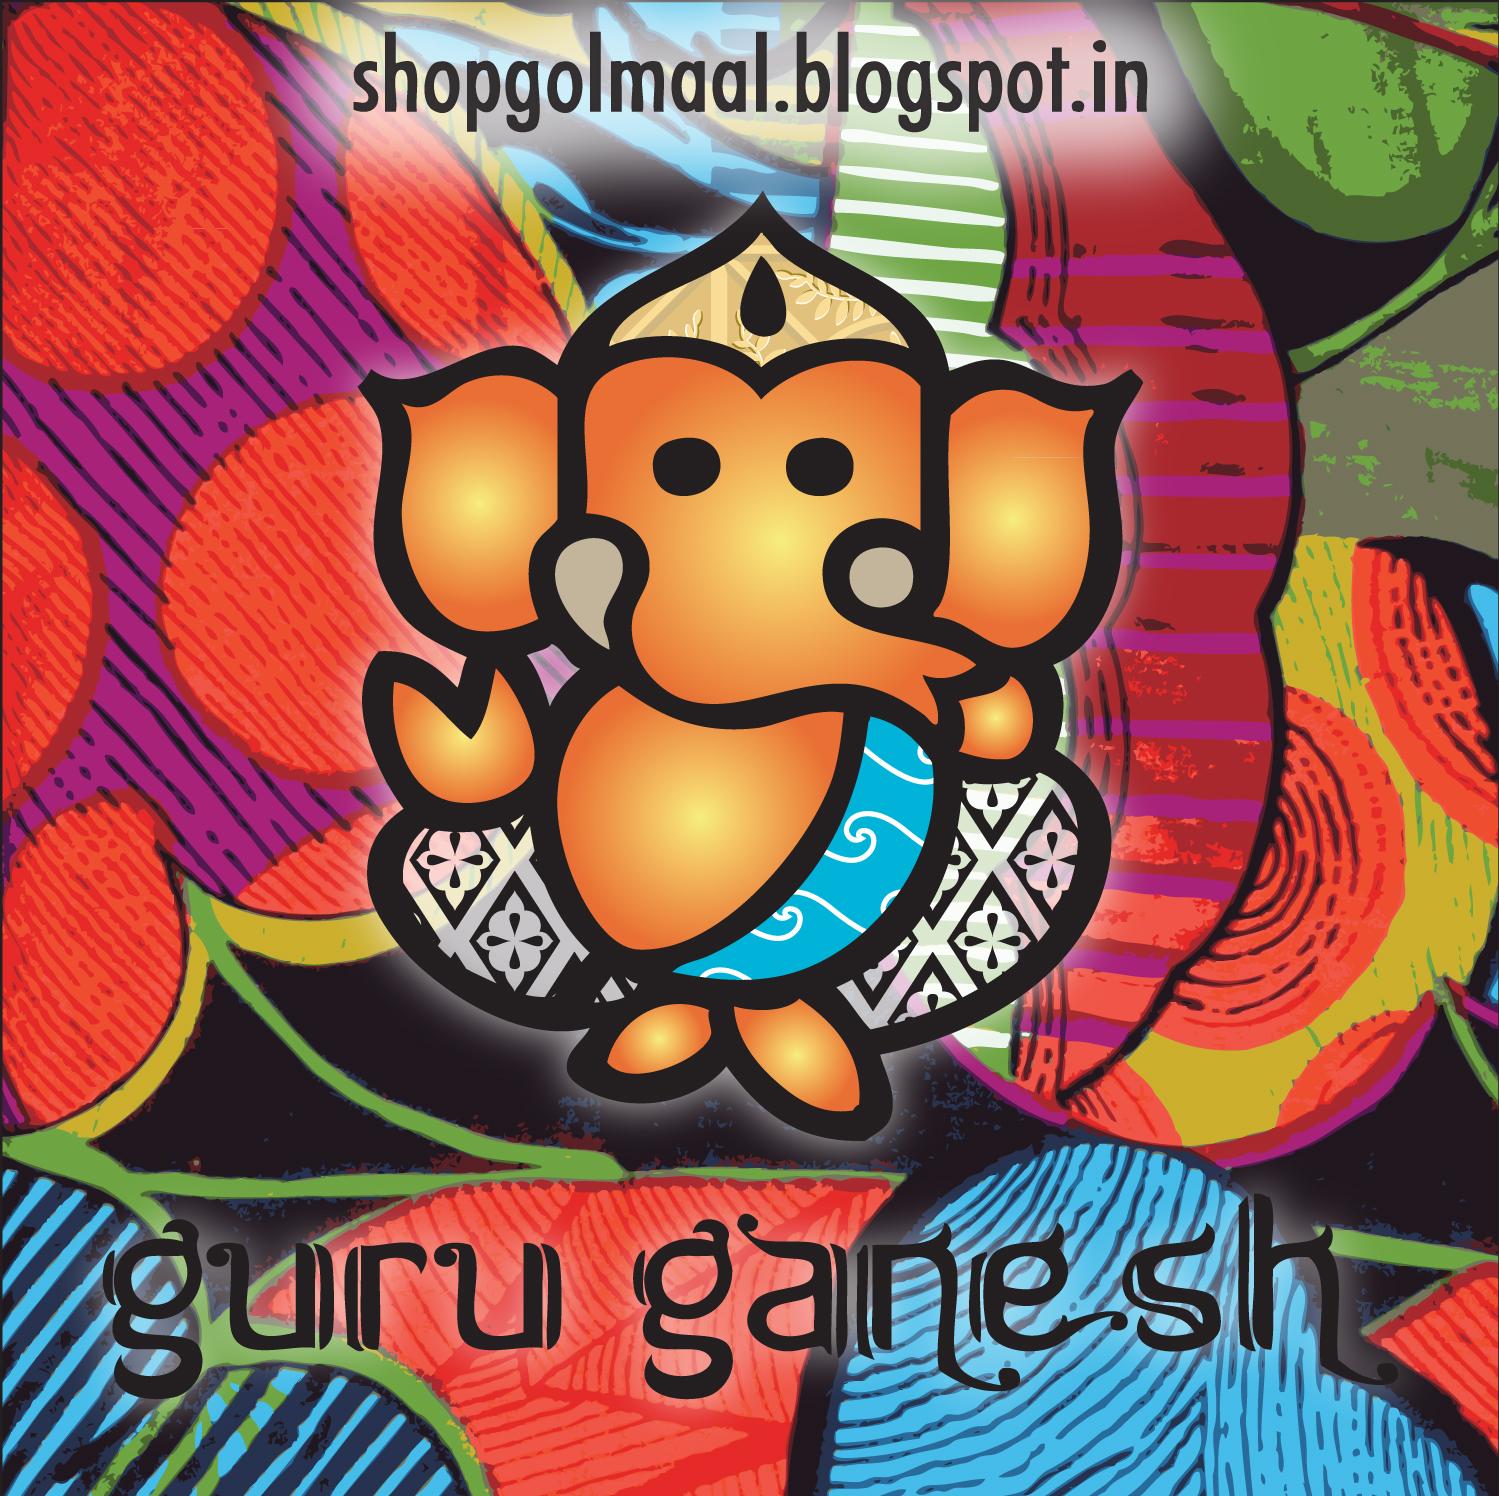 http://2.bp.blogspot.com/-dAS9NbUdyx8/UErOtpq9sEI/AAAAAAAABls/feJ2MJlxCXs/s1600/guru+ganesh.jpg